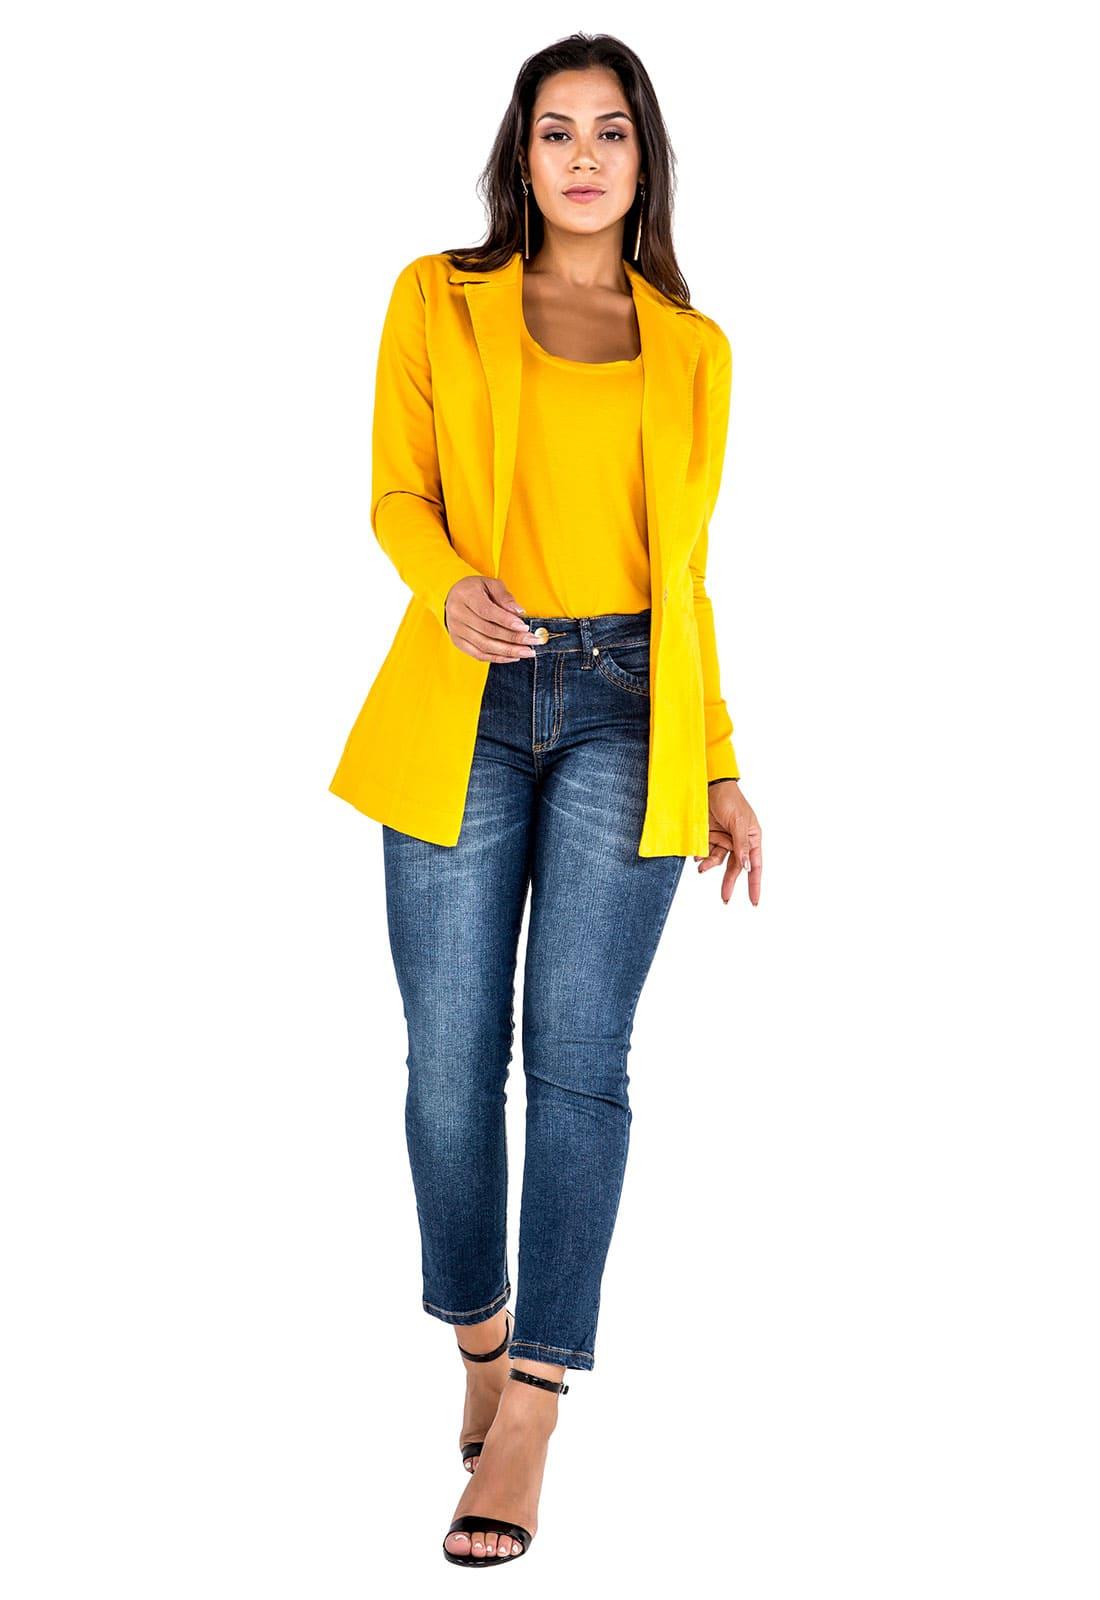 Blazer Boyfriend Feminino Longo Amarelo + Camiseta Feminina Amarelo + Calça Cropped Feminina Jeans Latifundio